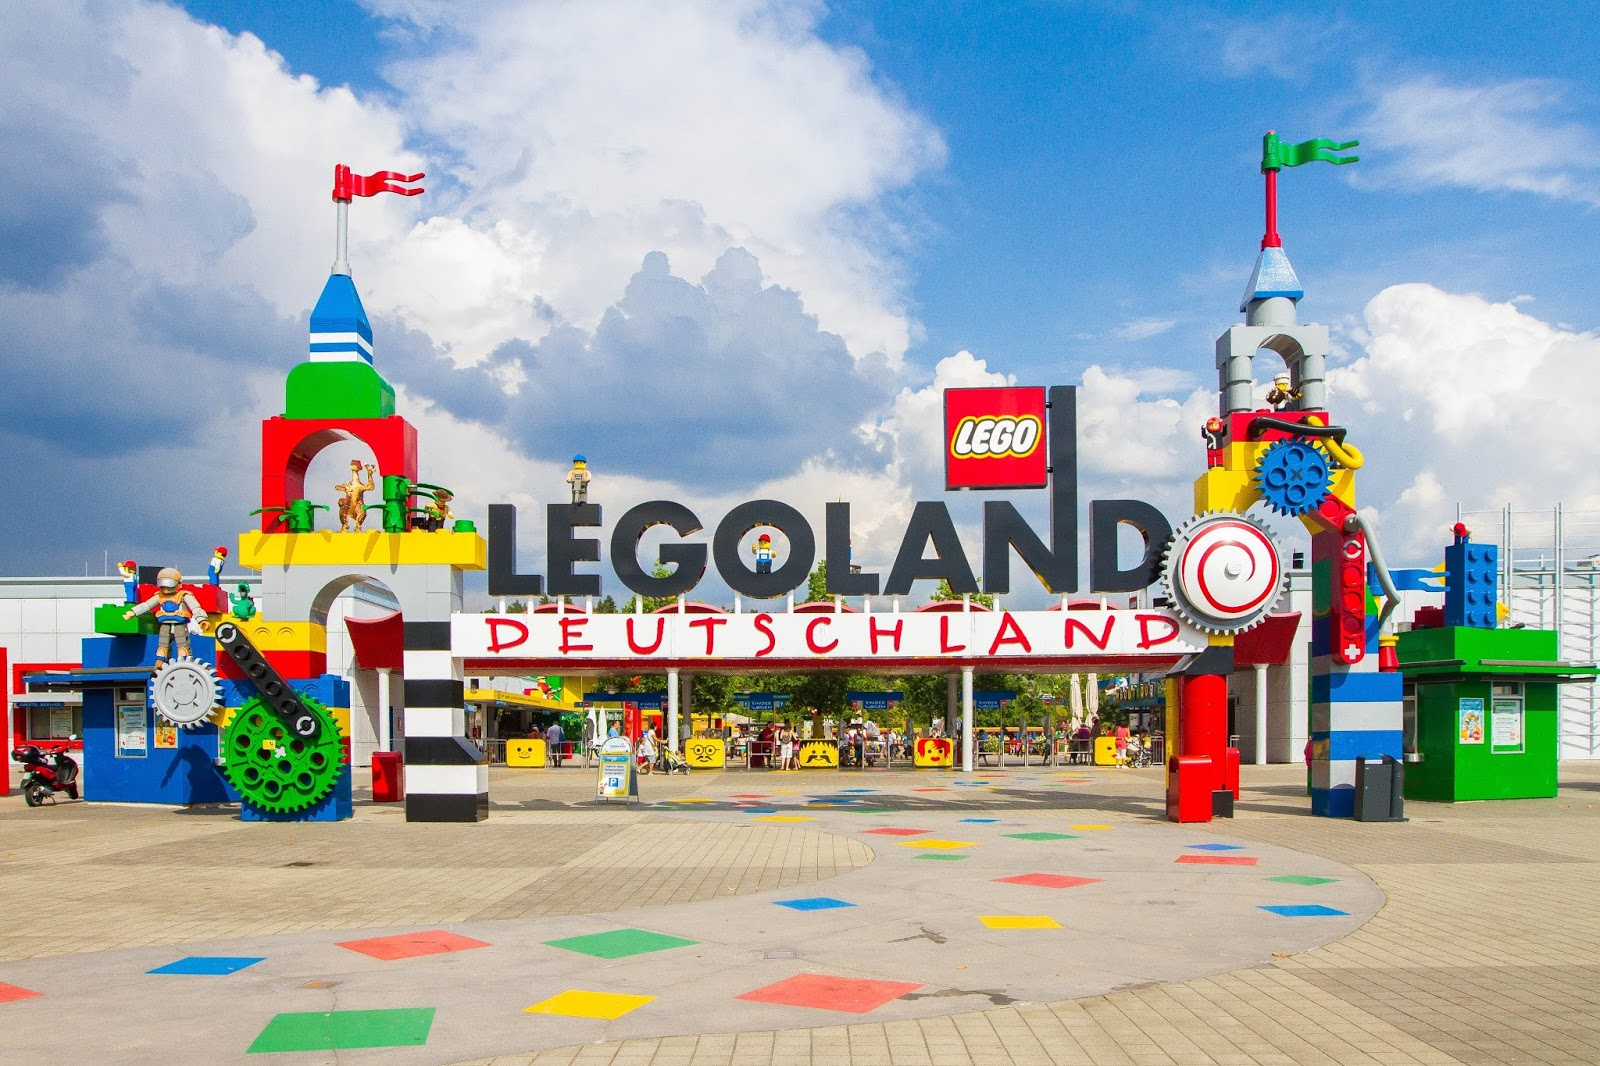 Harga Tiket Legoland 2018 Terbaru